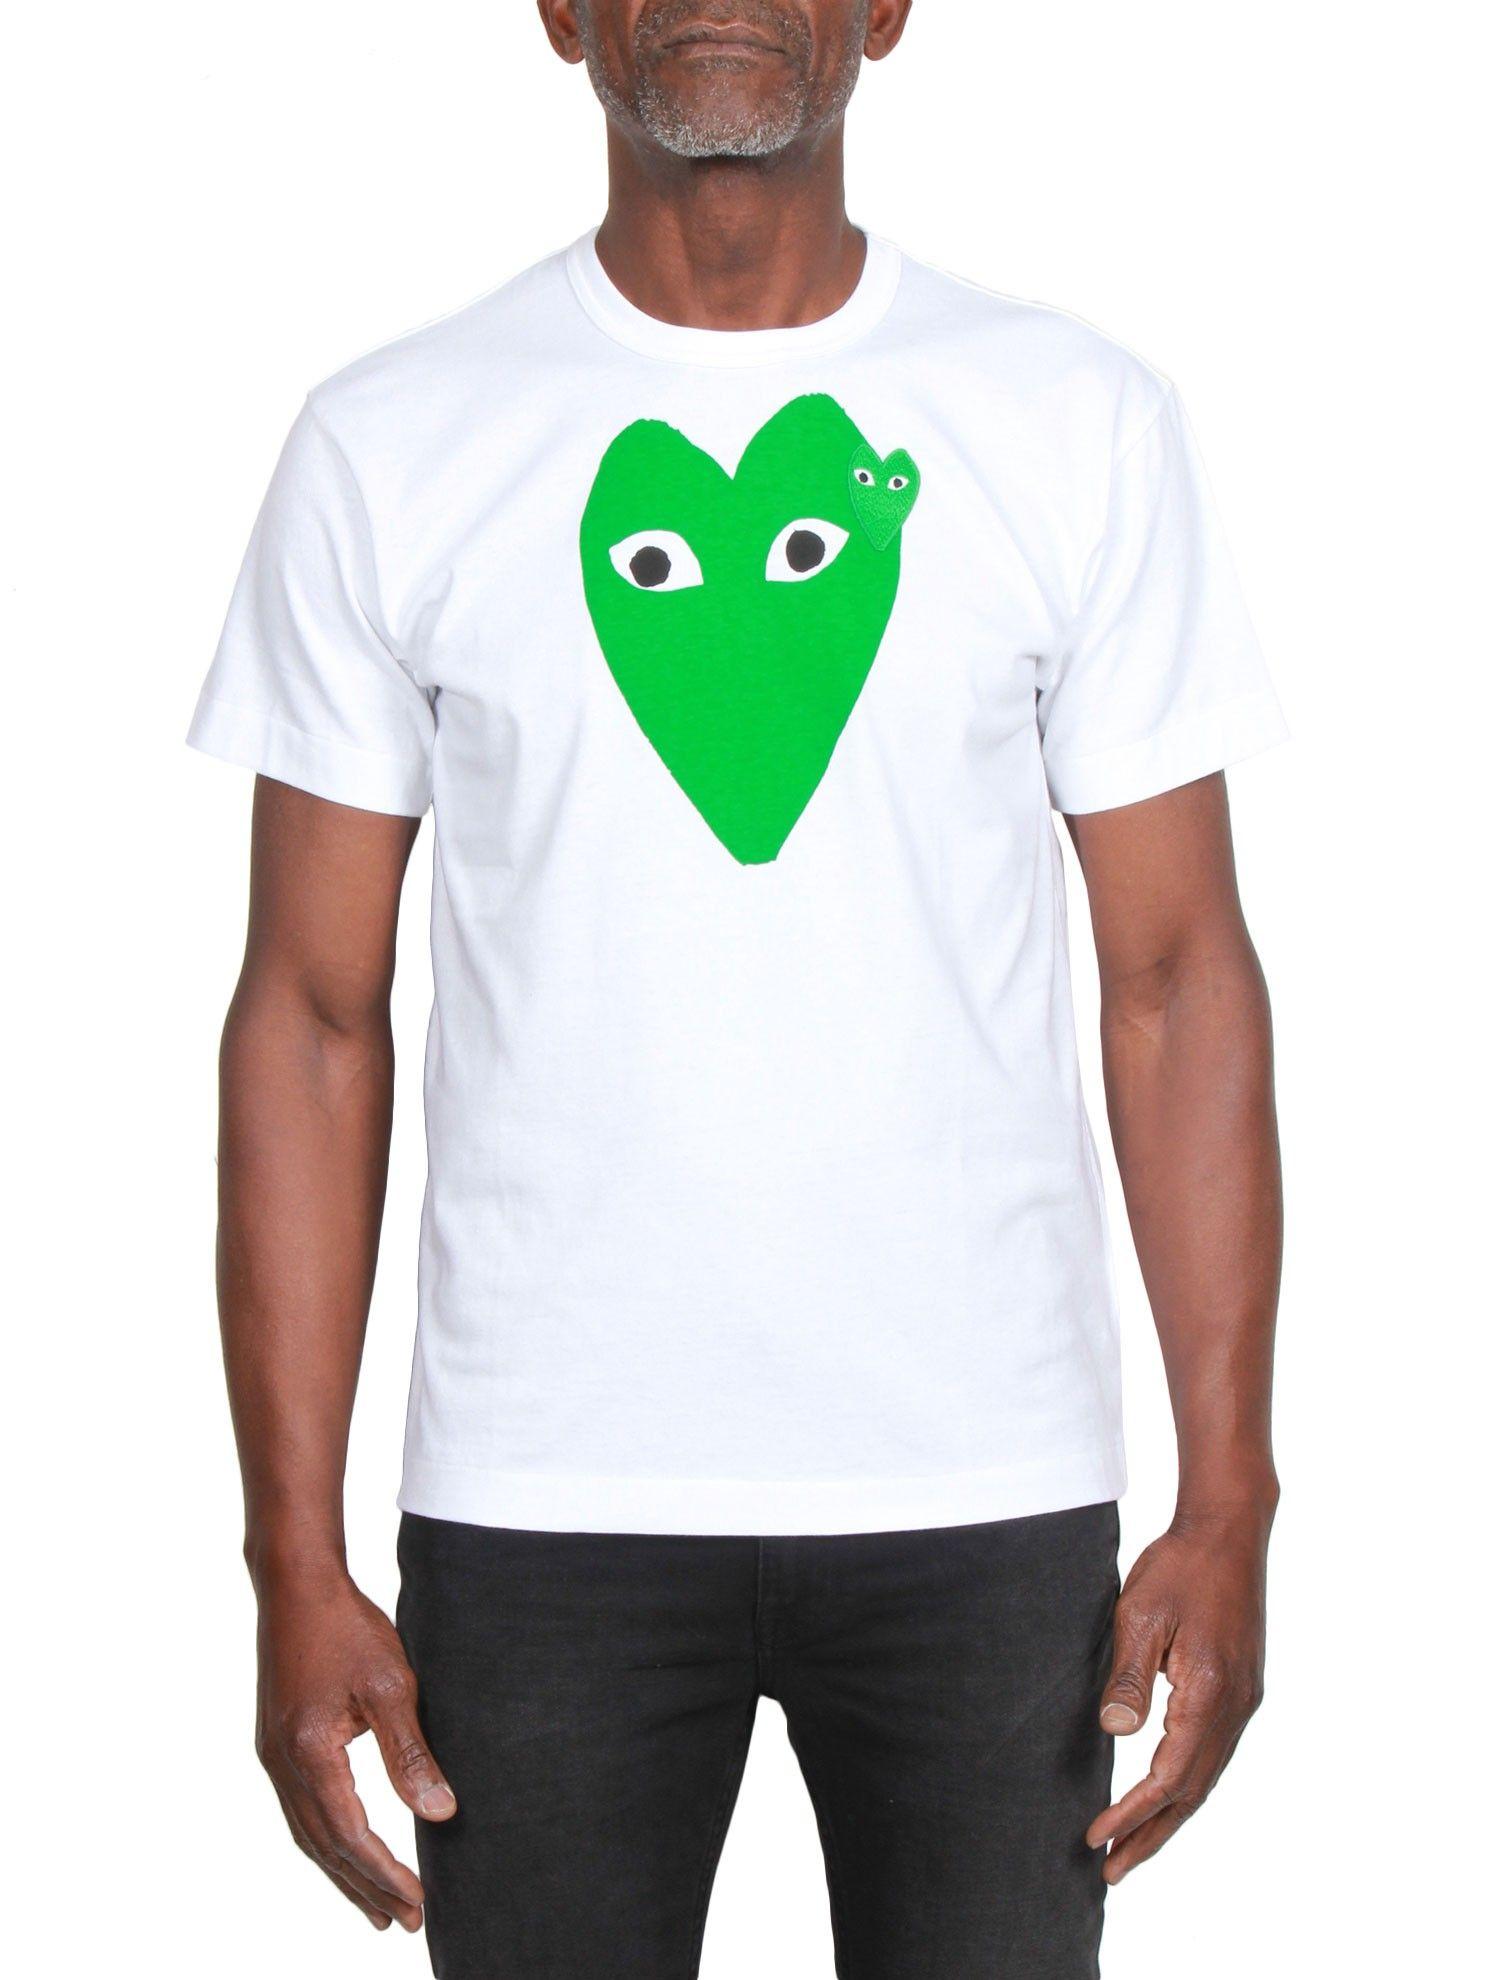 COMME DES GARÇONS Play - Tee-shirt Homme Manches Courtes Blanc - Coeur Vert  - serie  2e460c2663043